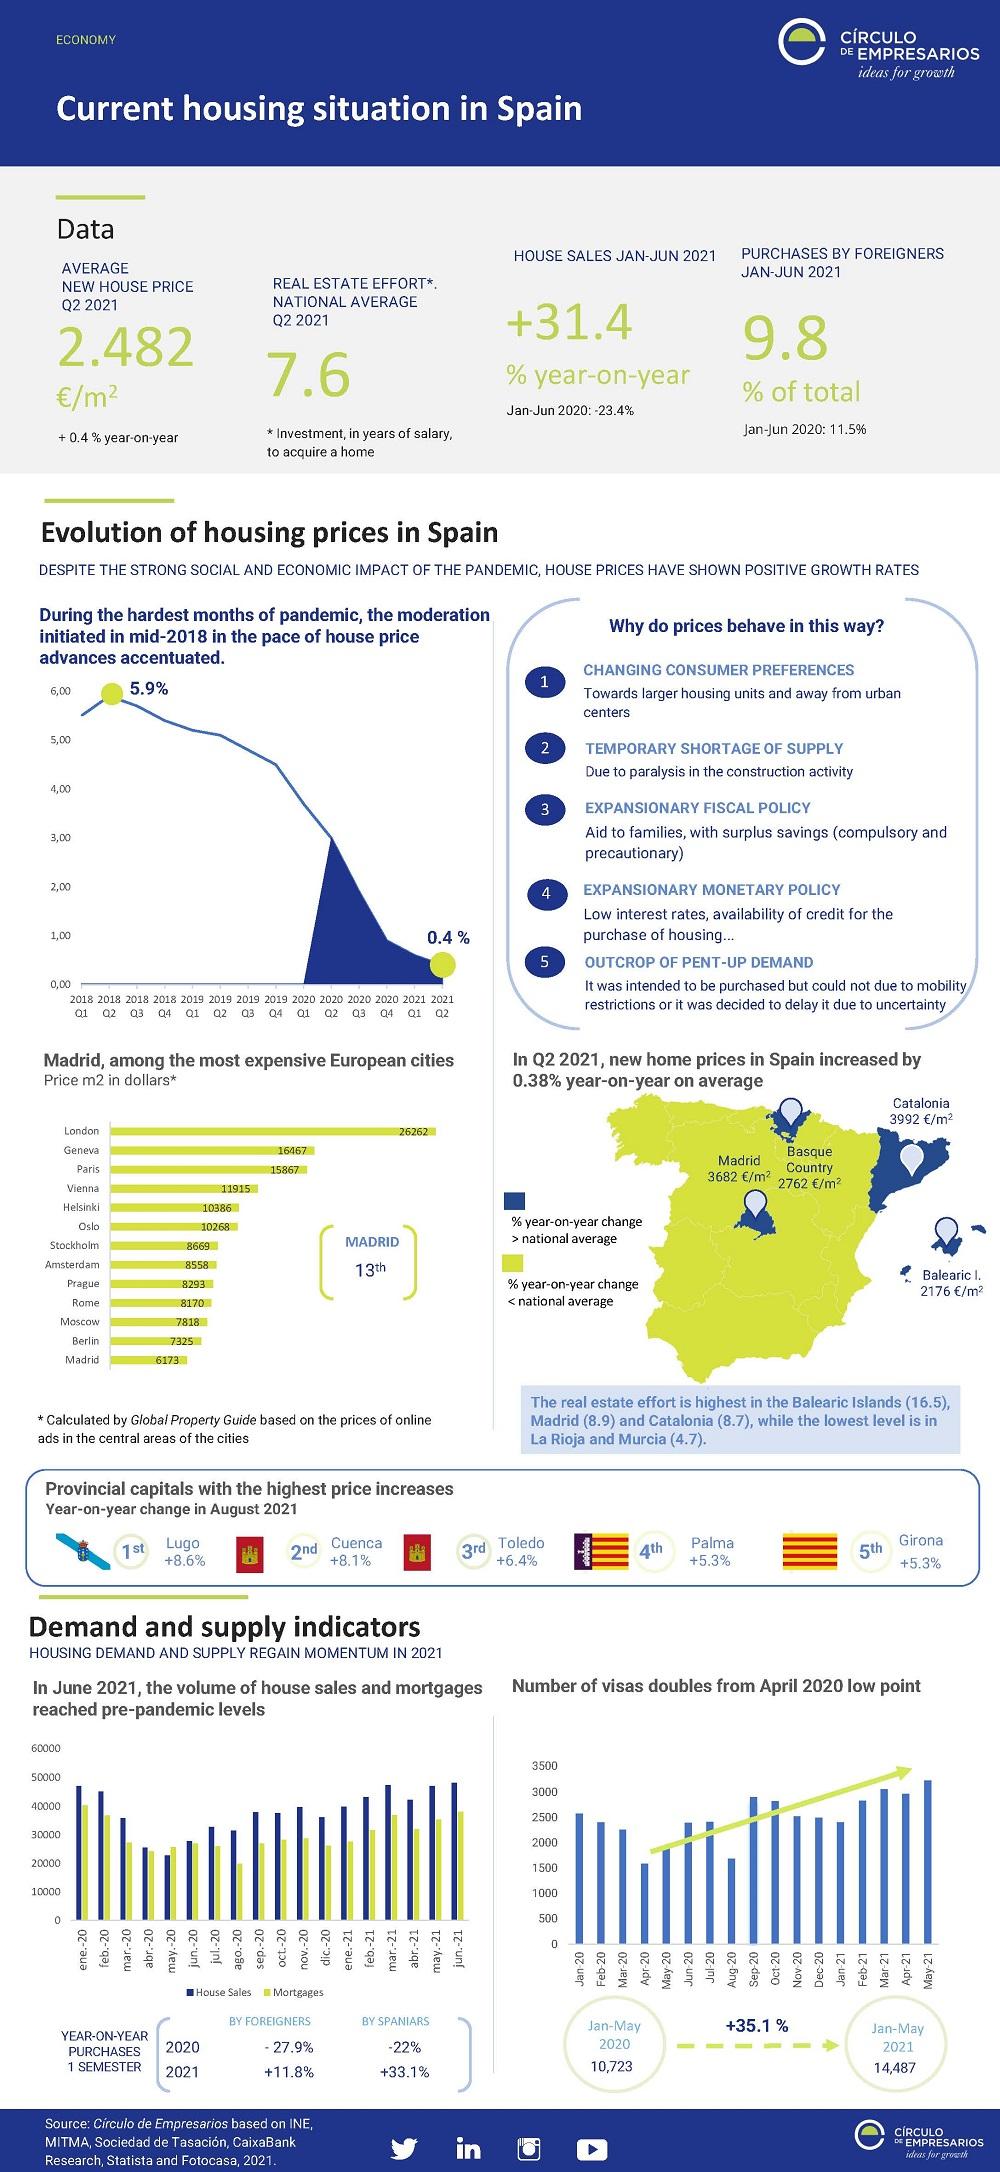 Current-housing-situation-in-Spain-September-2021-Circulo-de-Empresarios